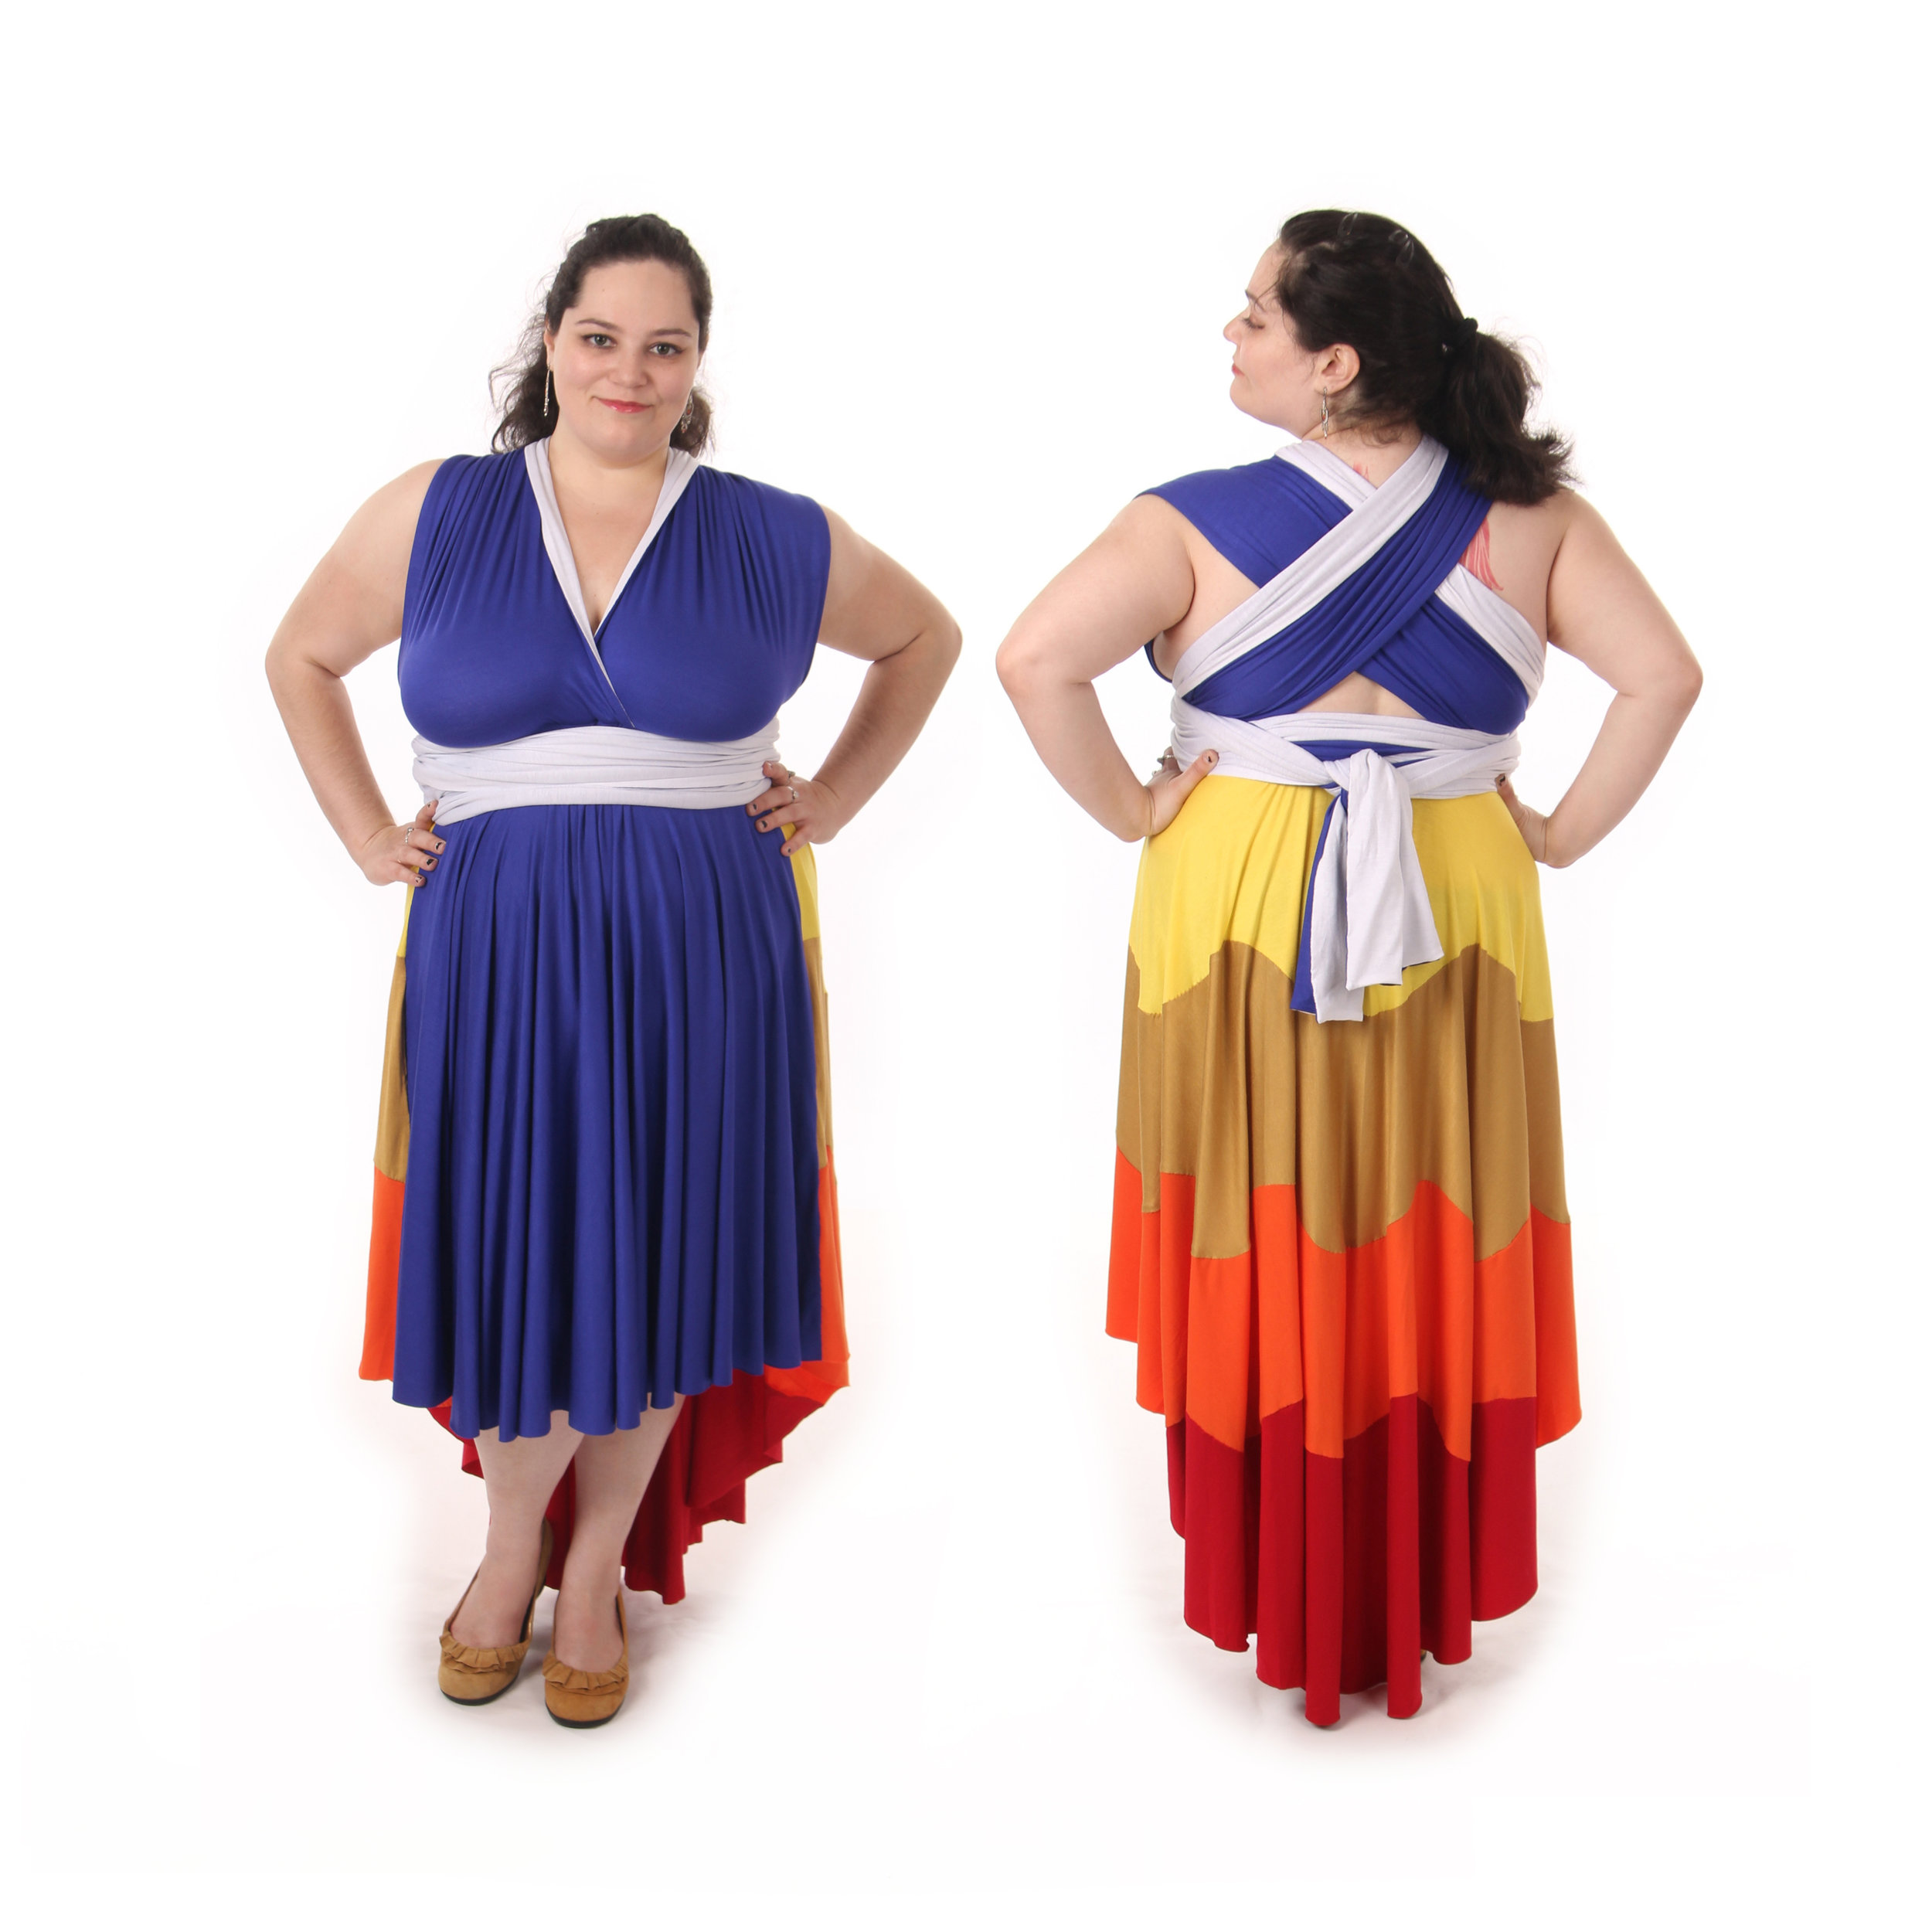 Flaming Hero Inspired Convertible Dress